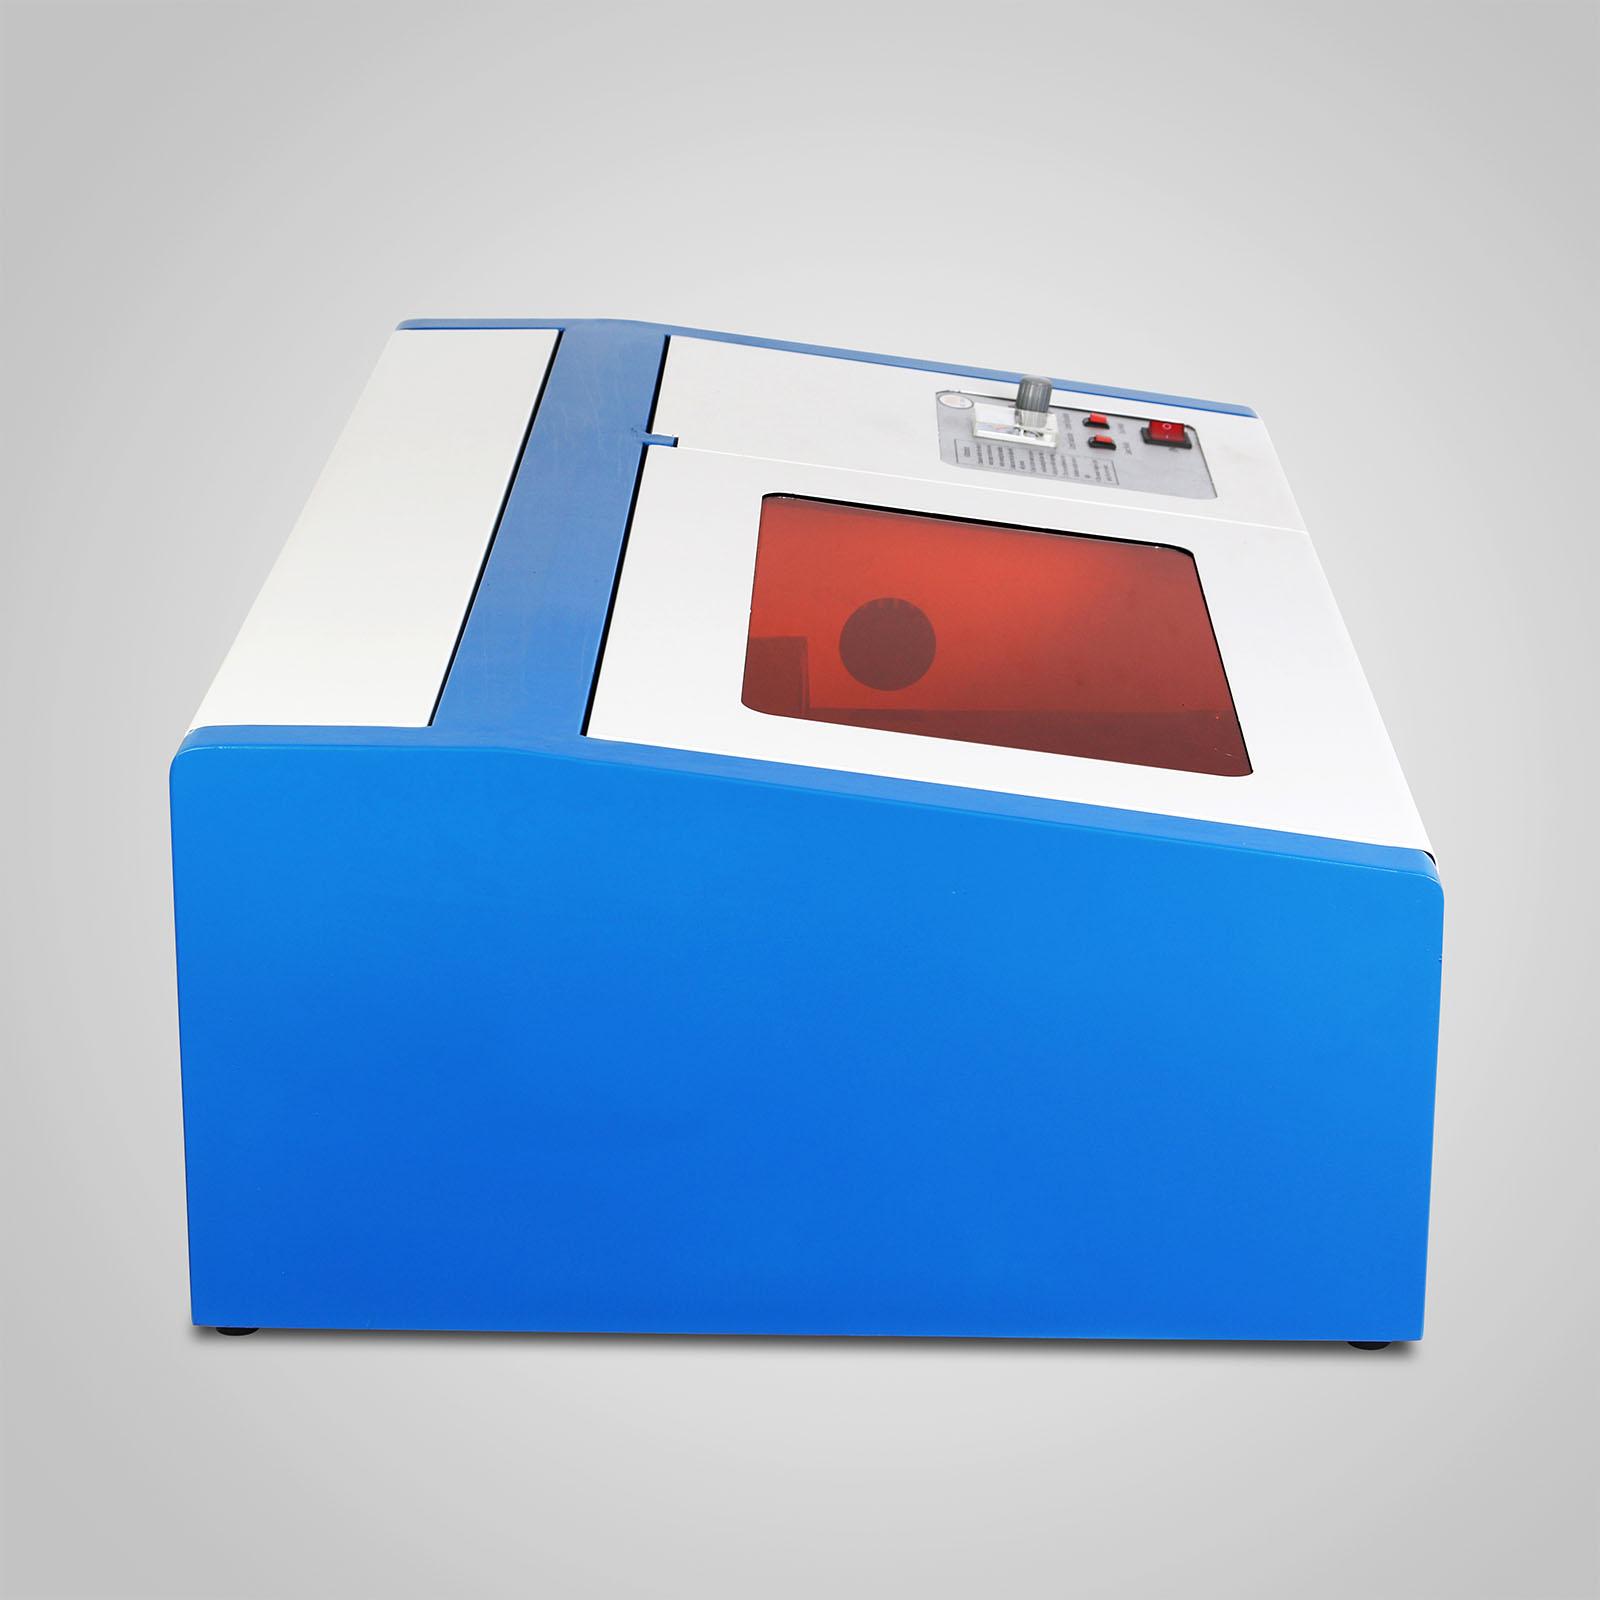 Macchina-per-Incisione-Laser-CO2-40-130W-Asse-Rotante-Tagliatrice-Incisore miniatura 17